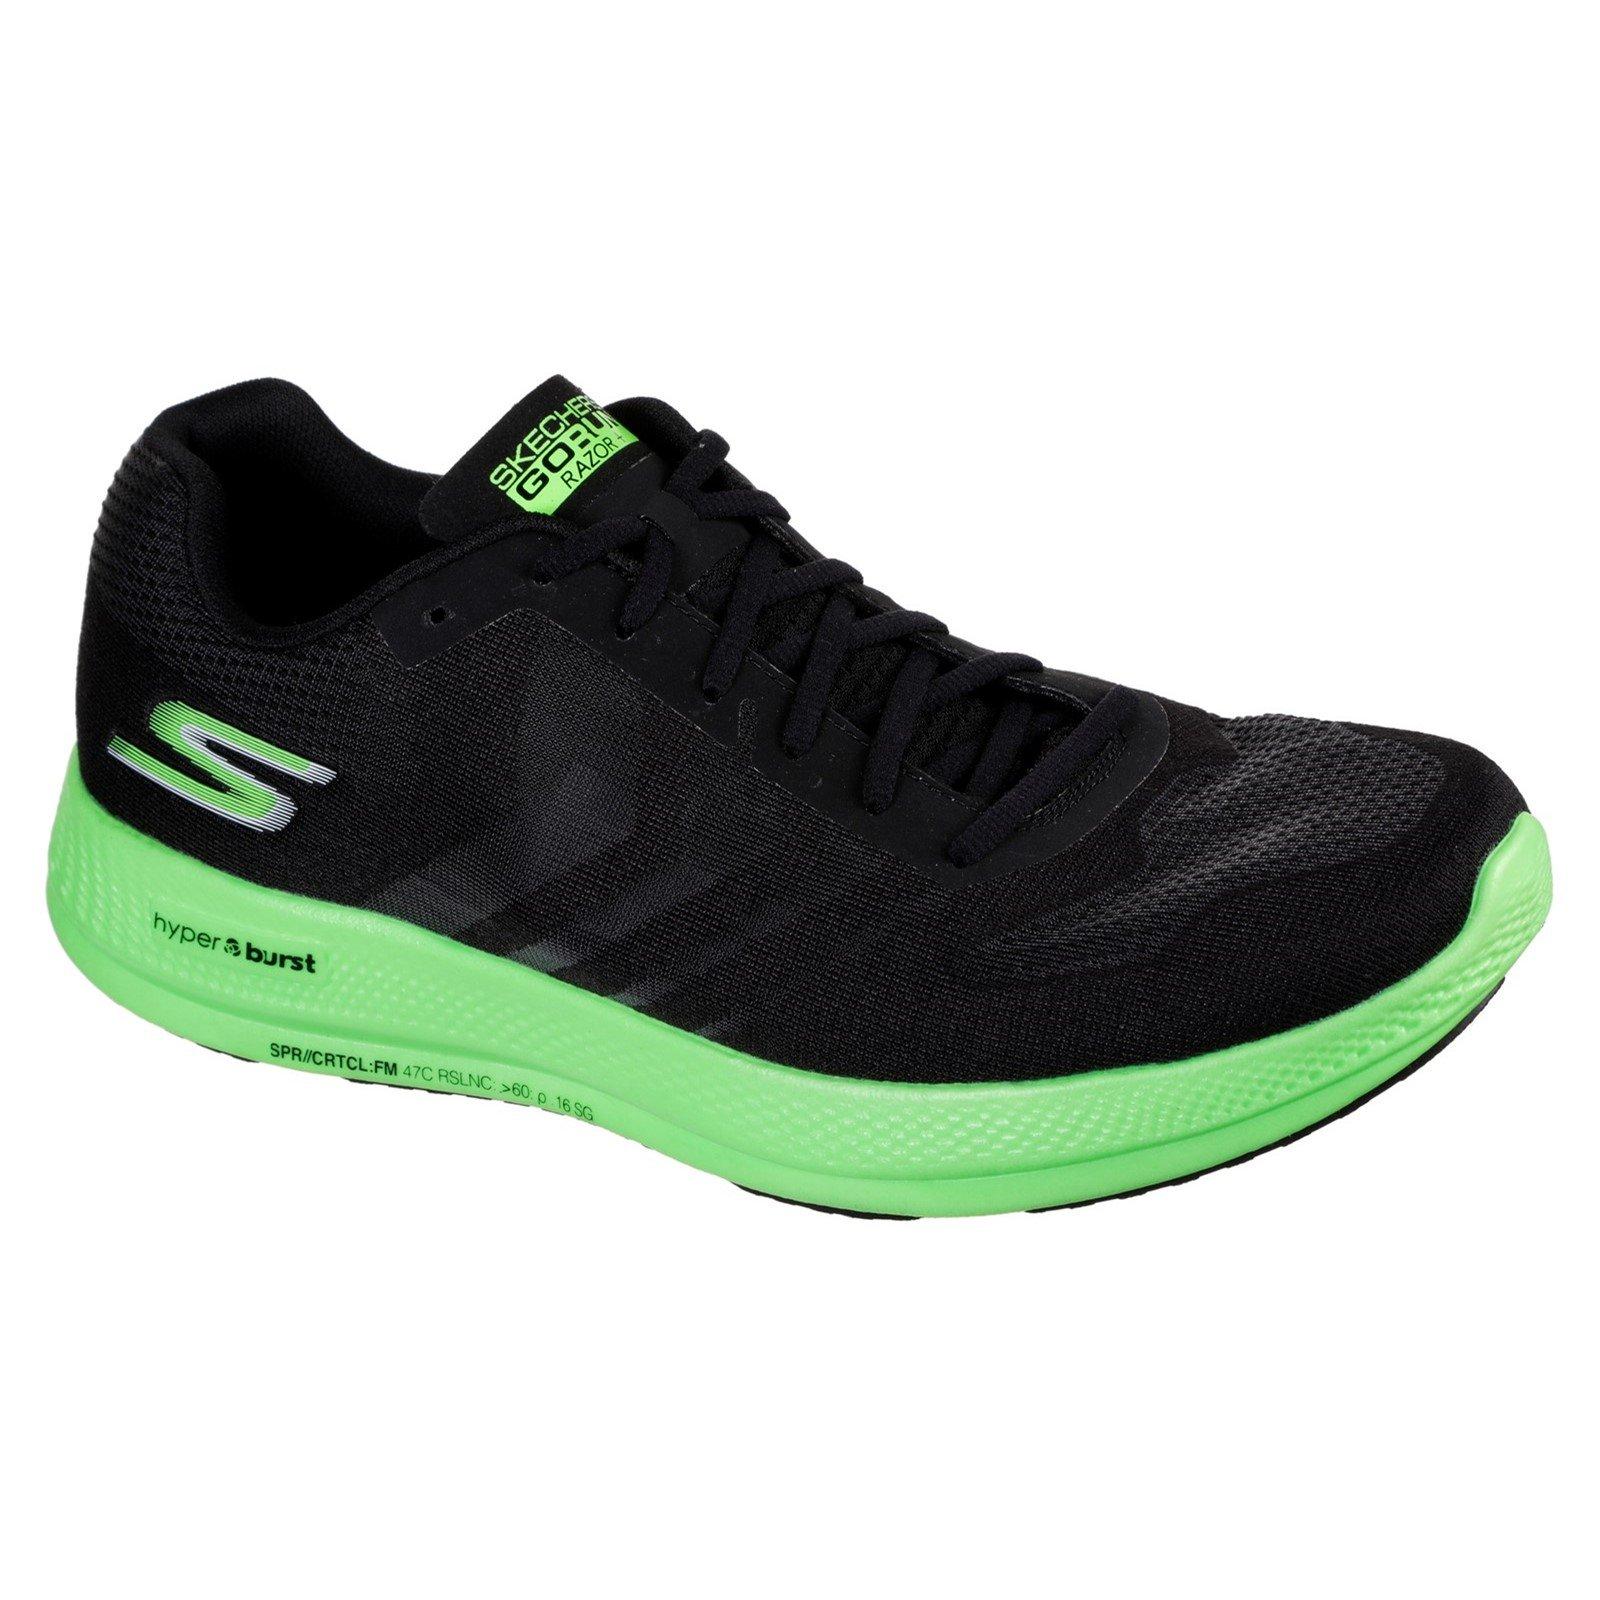 Skechers Men's Go Run Razor Trainer Multicolor 32699 - Black/Green 9